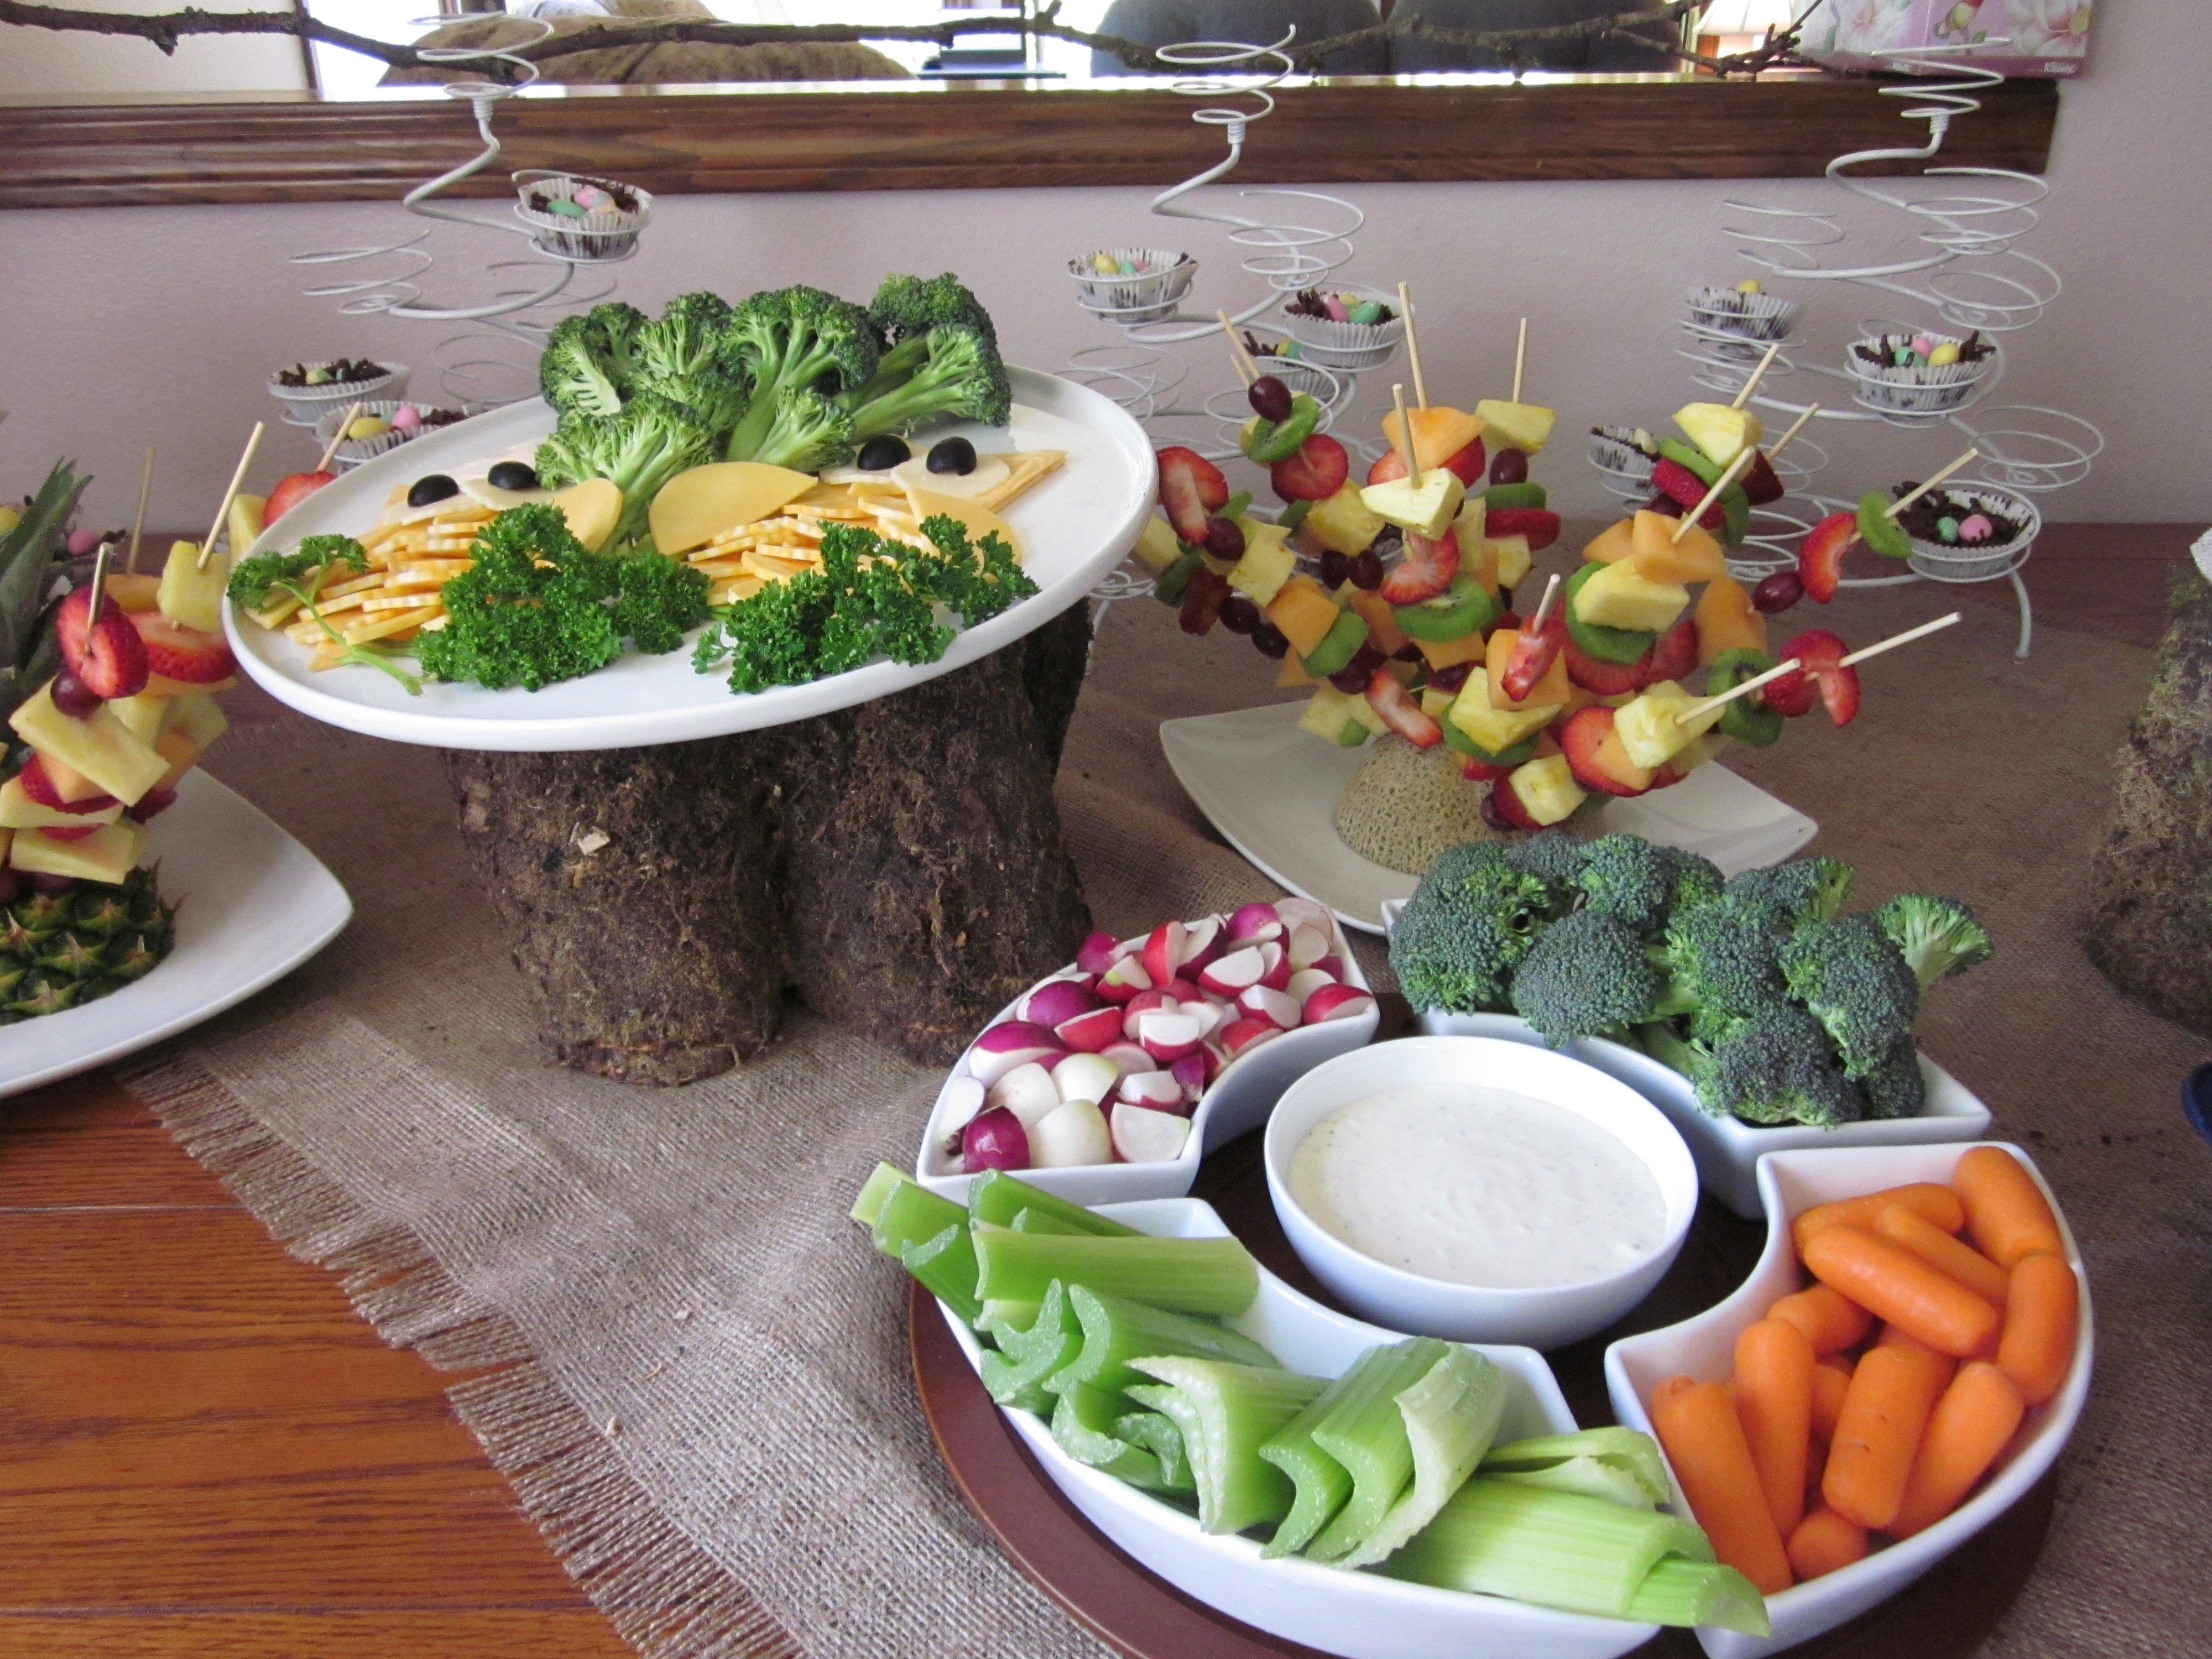 10 Spectacular Boy Baby Shower Food Ideas surprising baby shower lunchas finger food for boy fall luncheon 2020